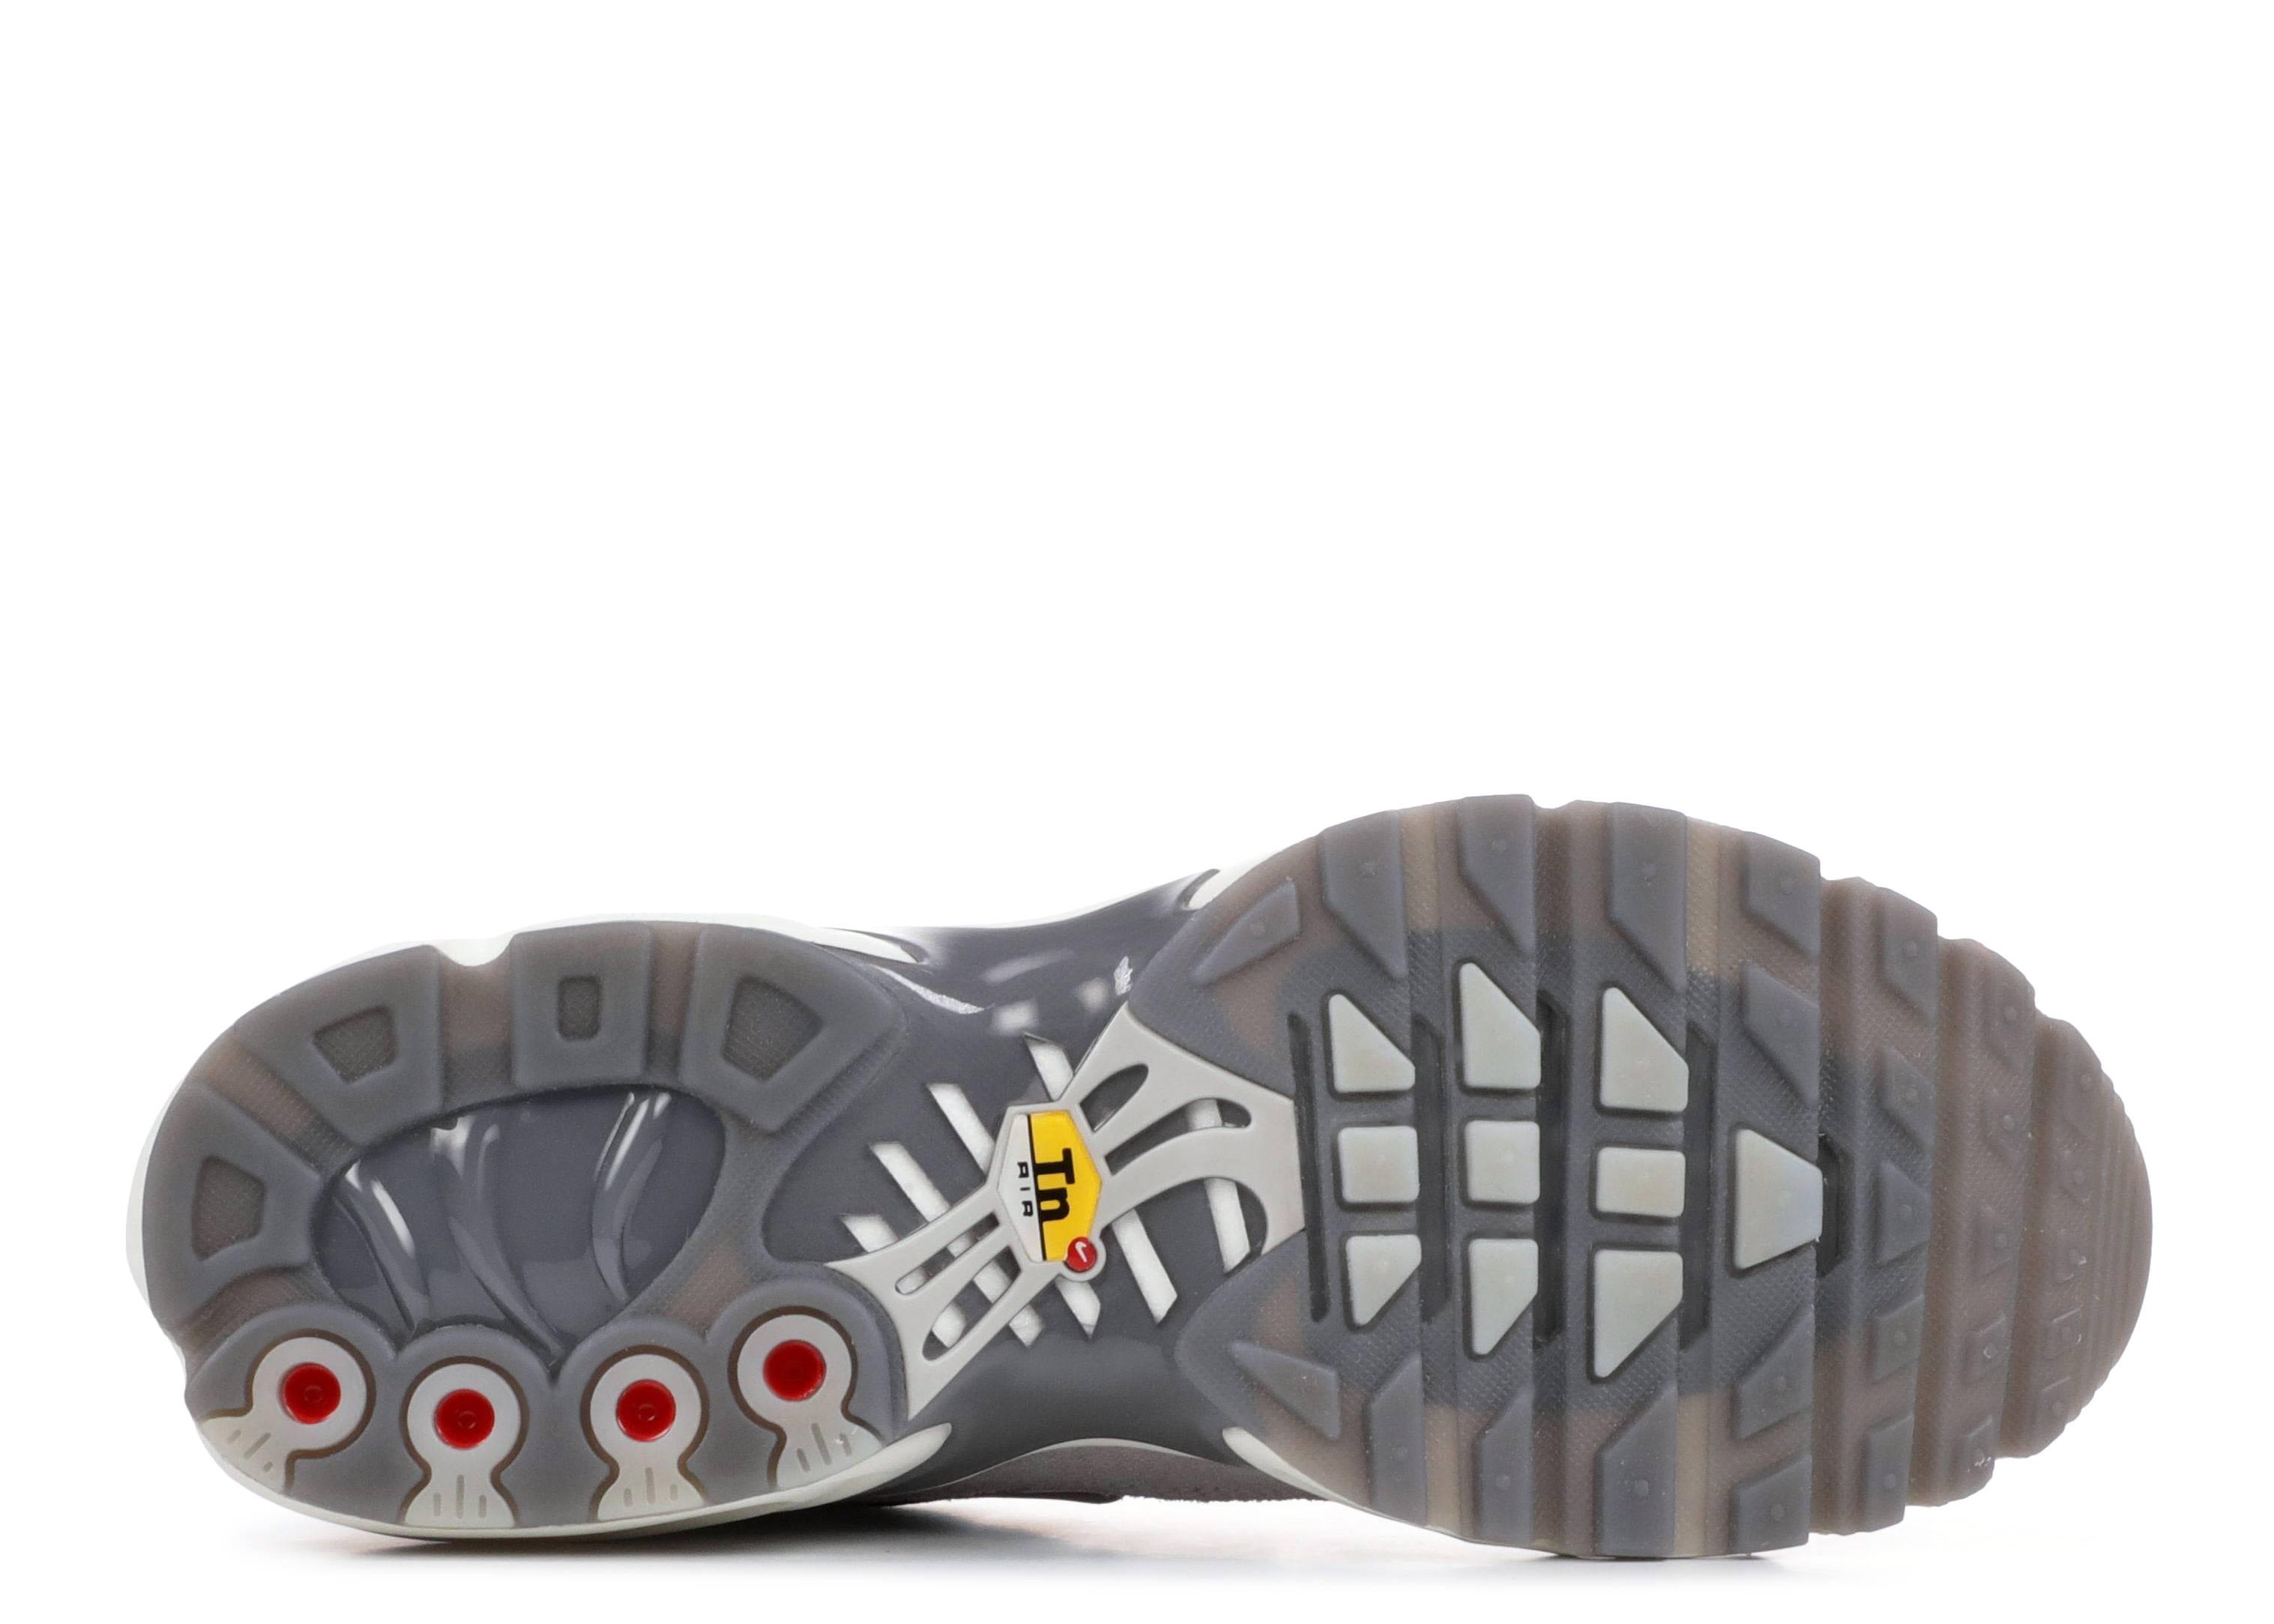 Wmns Air Max Plus Lx - Nike - ah6788 001 - gunsmoke atmosphere grey ... b53f0f588